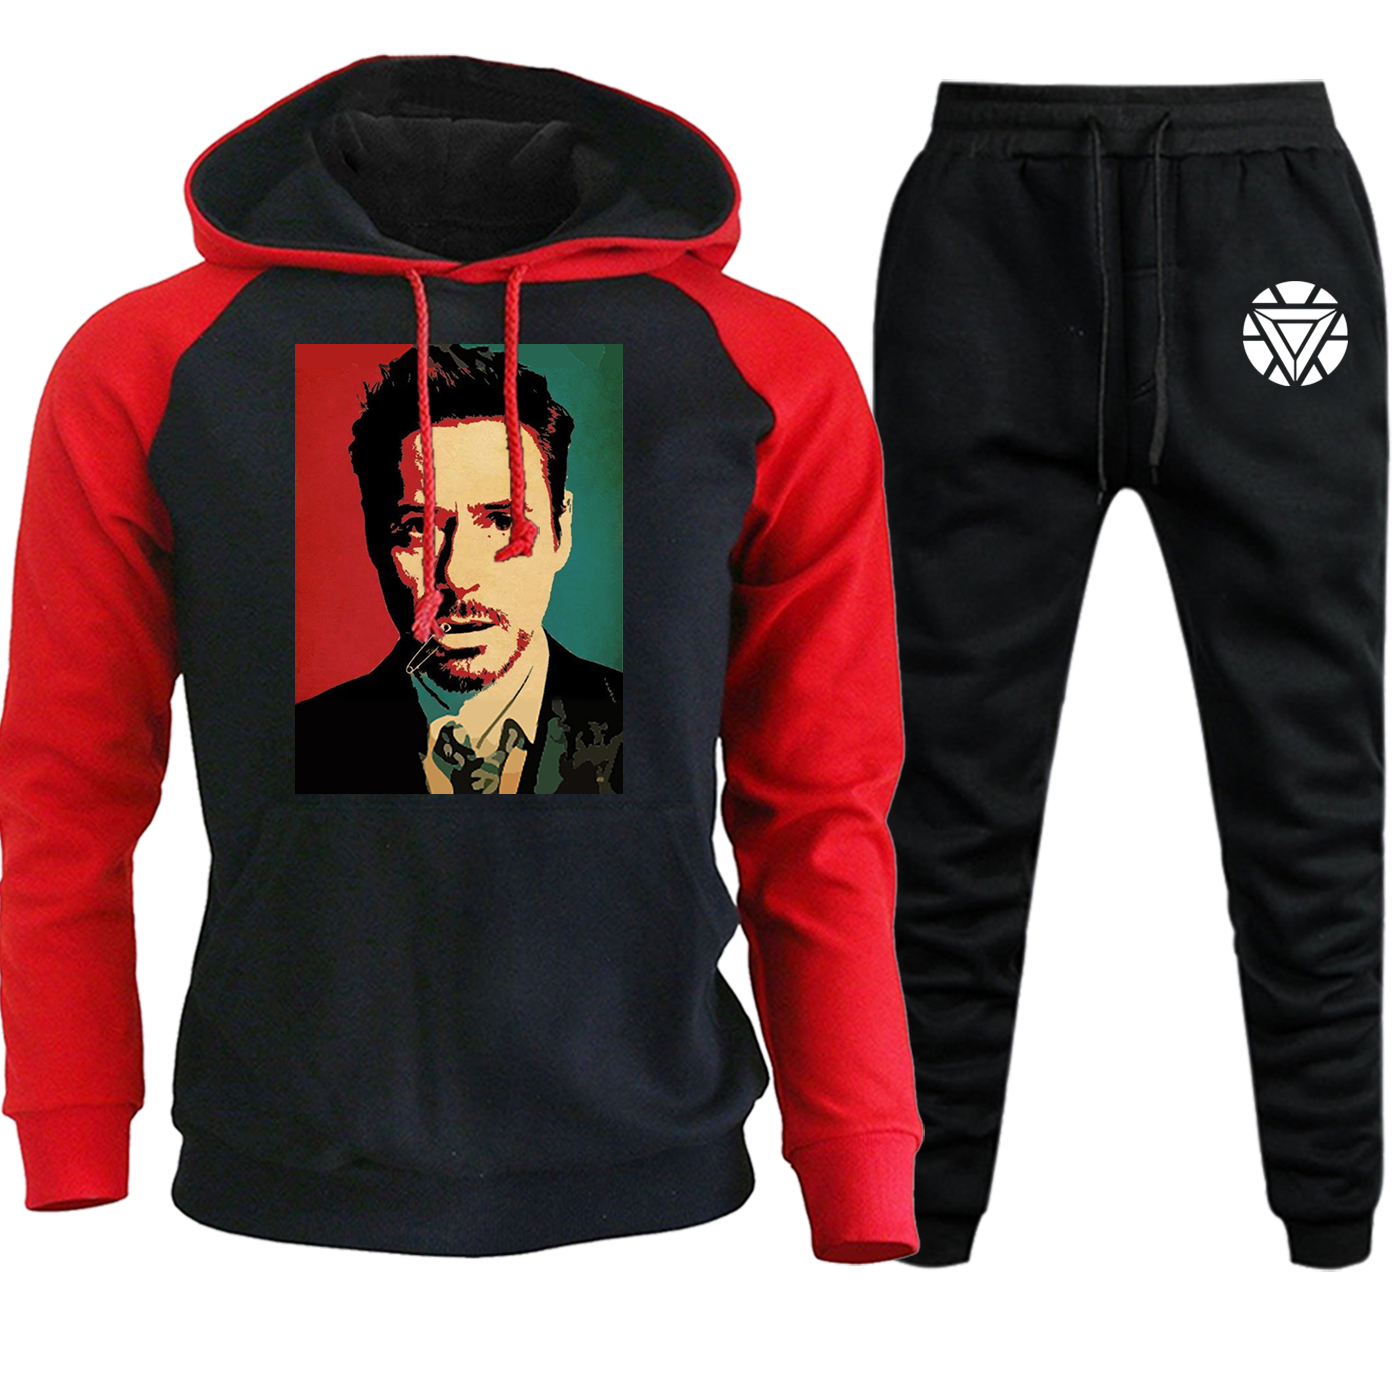 Tony Stark Hoodies Mens Autumn Winter Iron Man Streetwear Raglan The Avengters Hip Hop Pullover Fleece Hooded+Pants 2 Piece Set